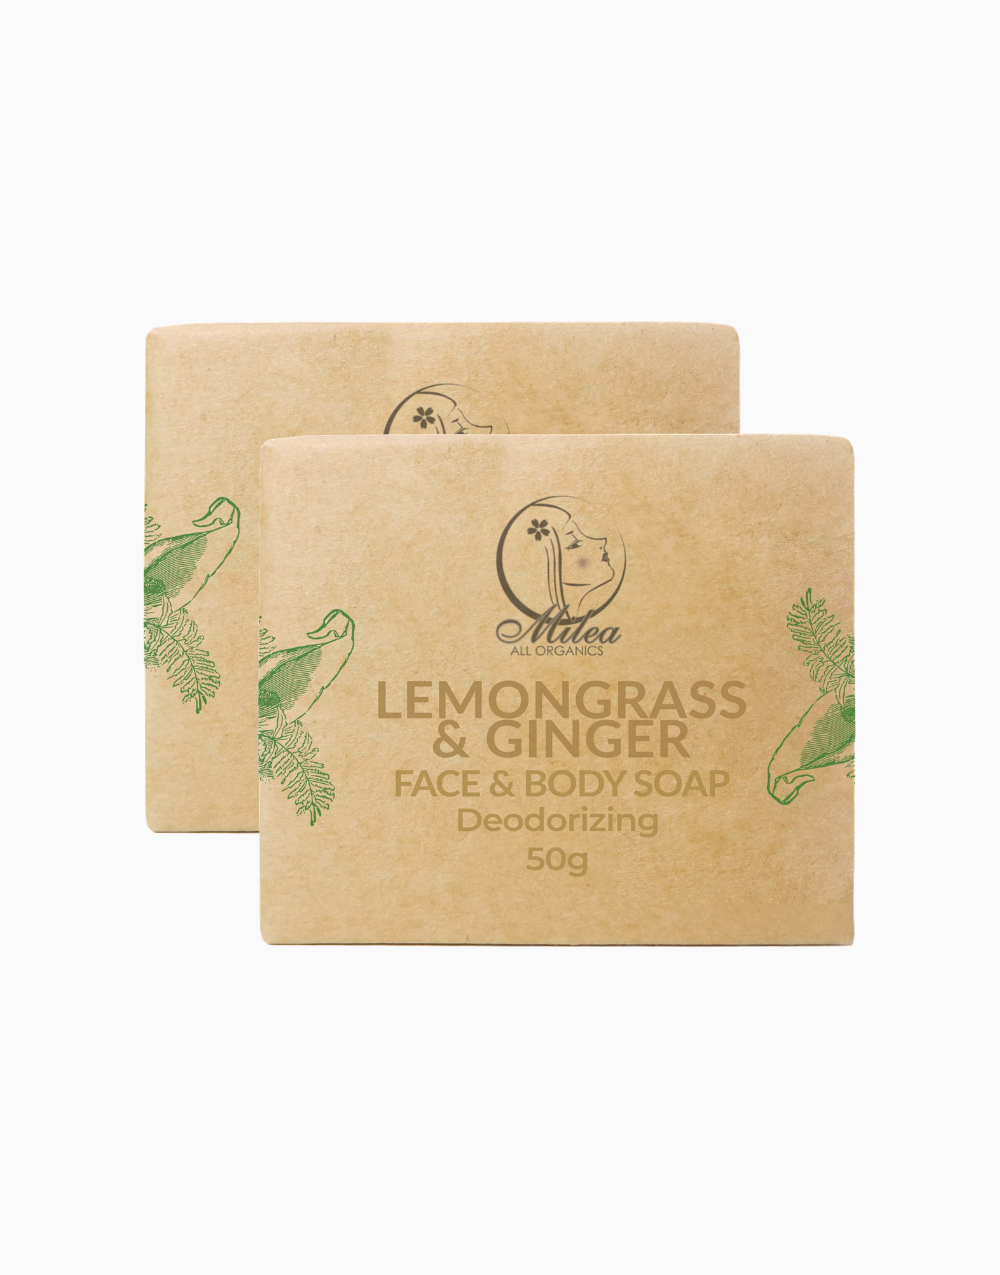 Lemongrass & Ginger Soap (50g x 2pcs) by Milea